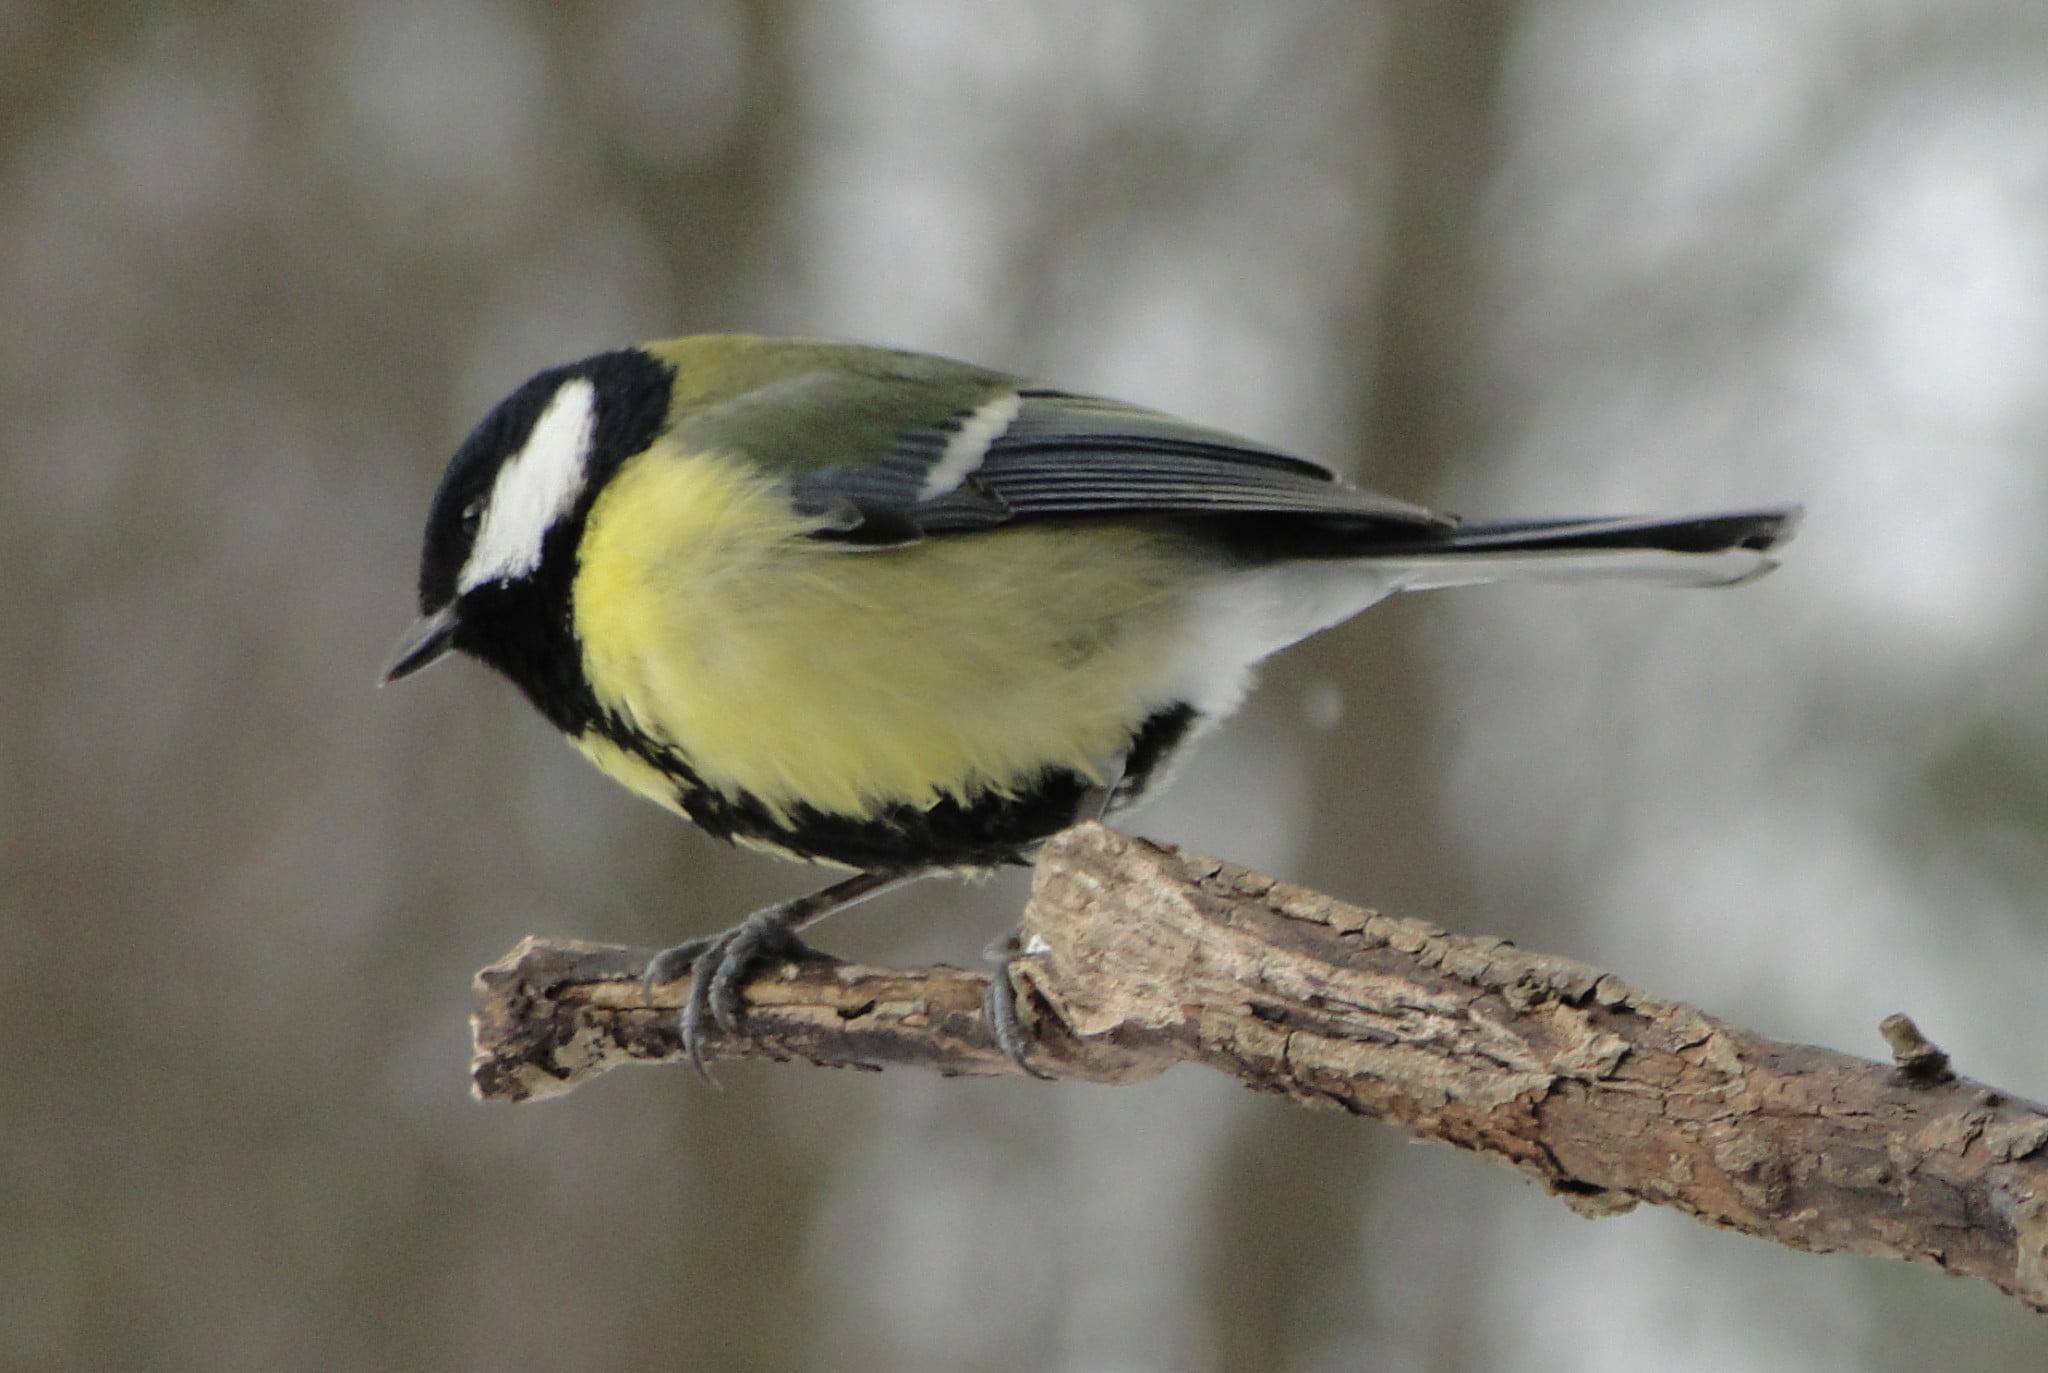 Nasi zimowi ptasi przyjaciele 3